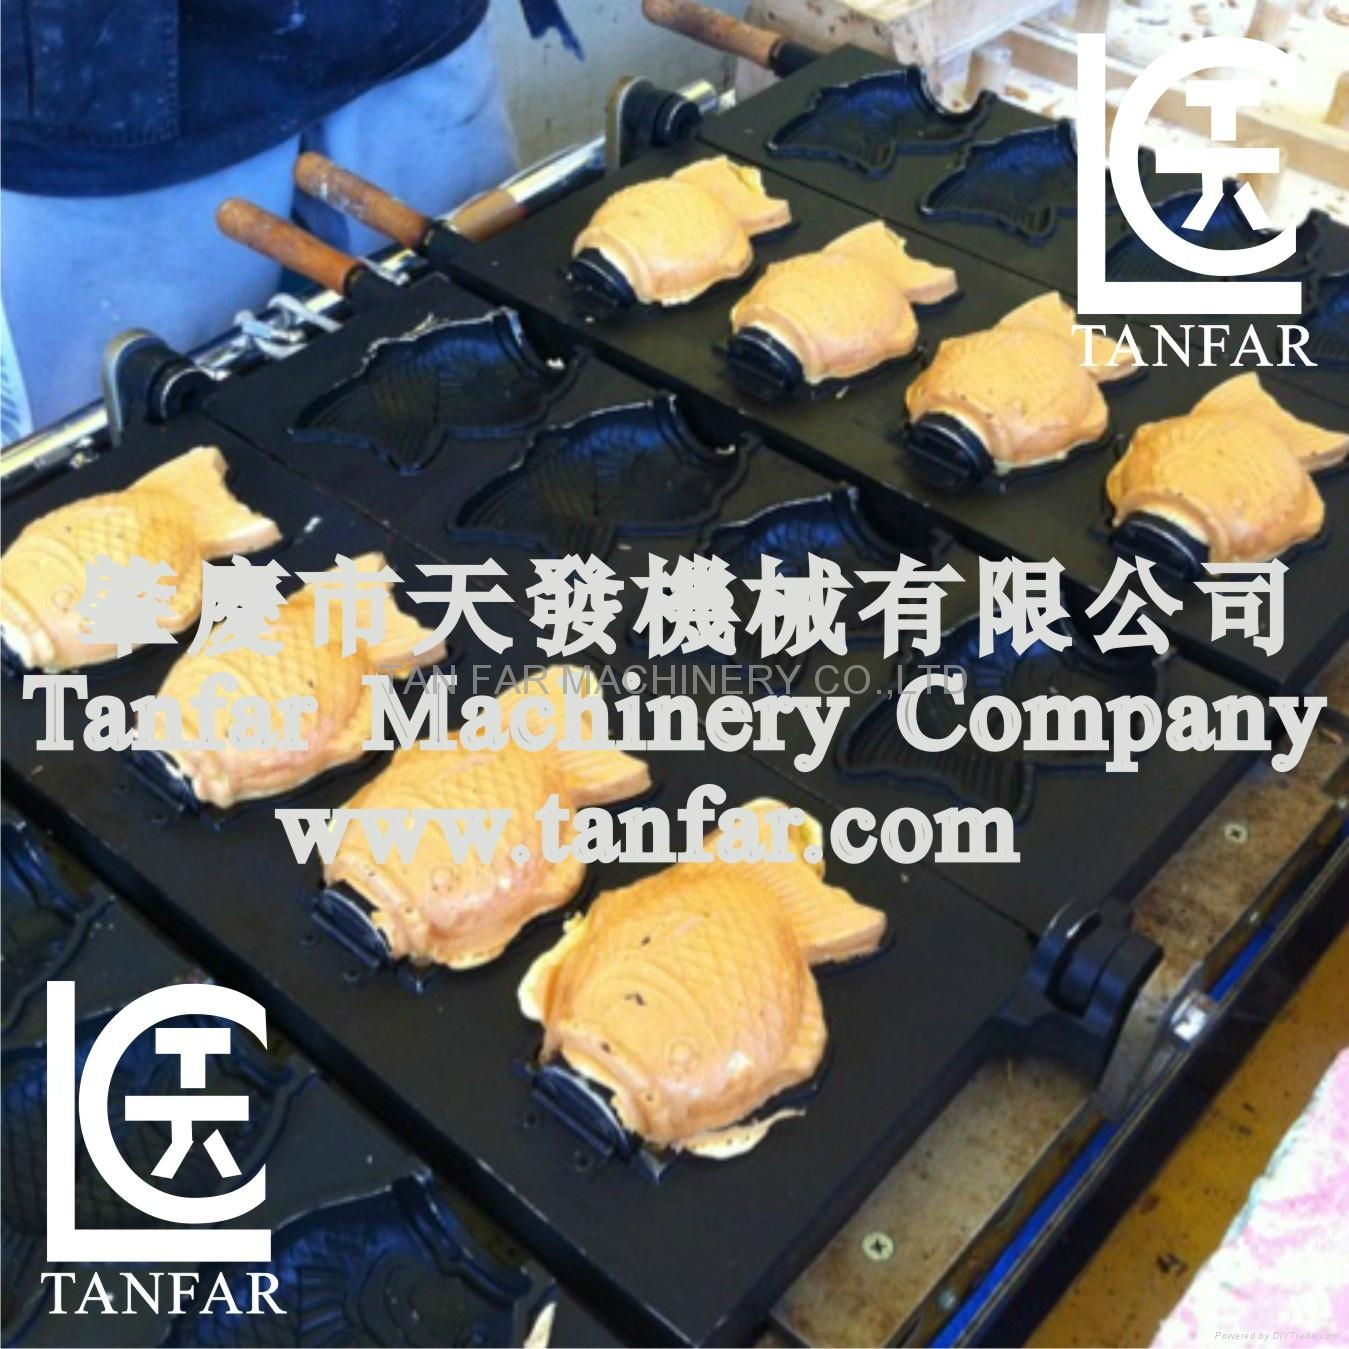 TANFAR hot sale eggette making machine for sale 5